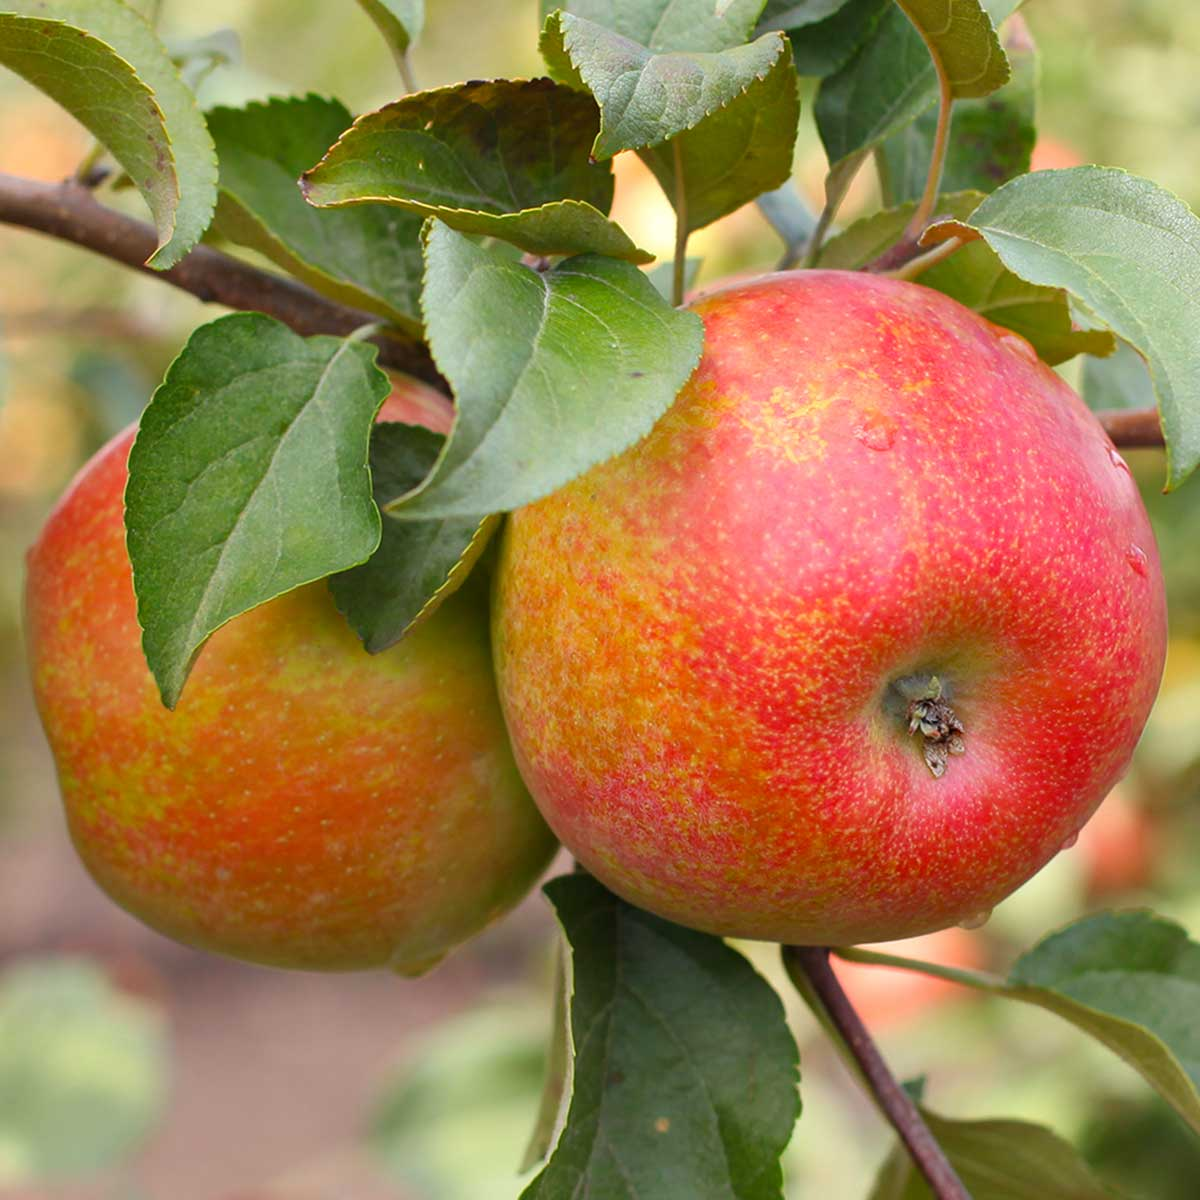 Honeycrisp Apples on an Apple Tree